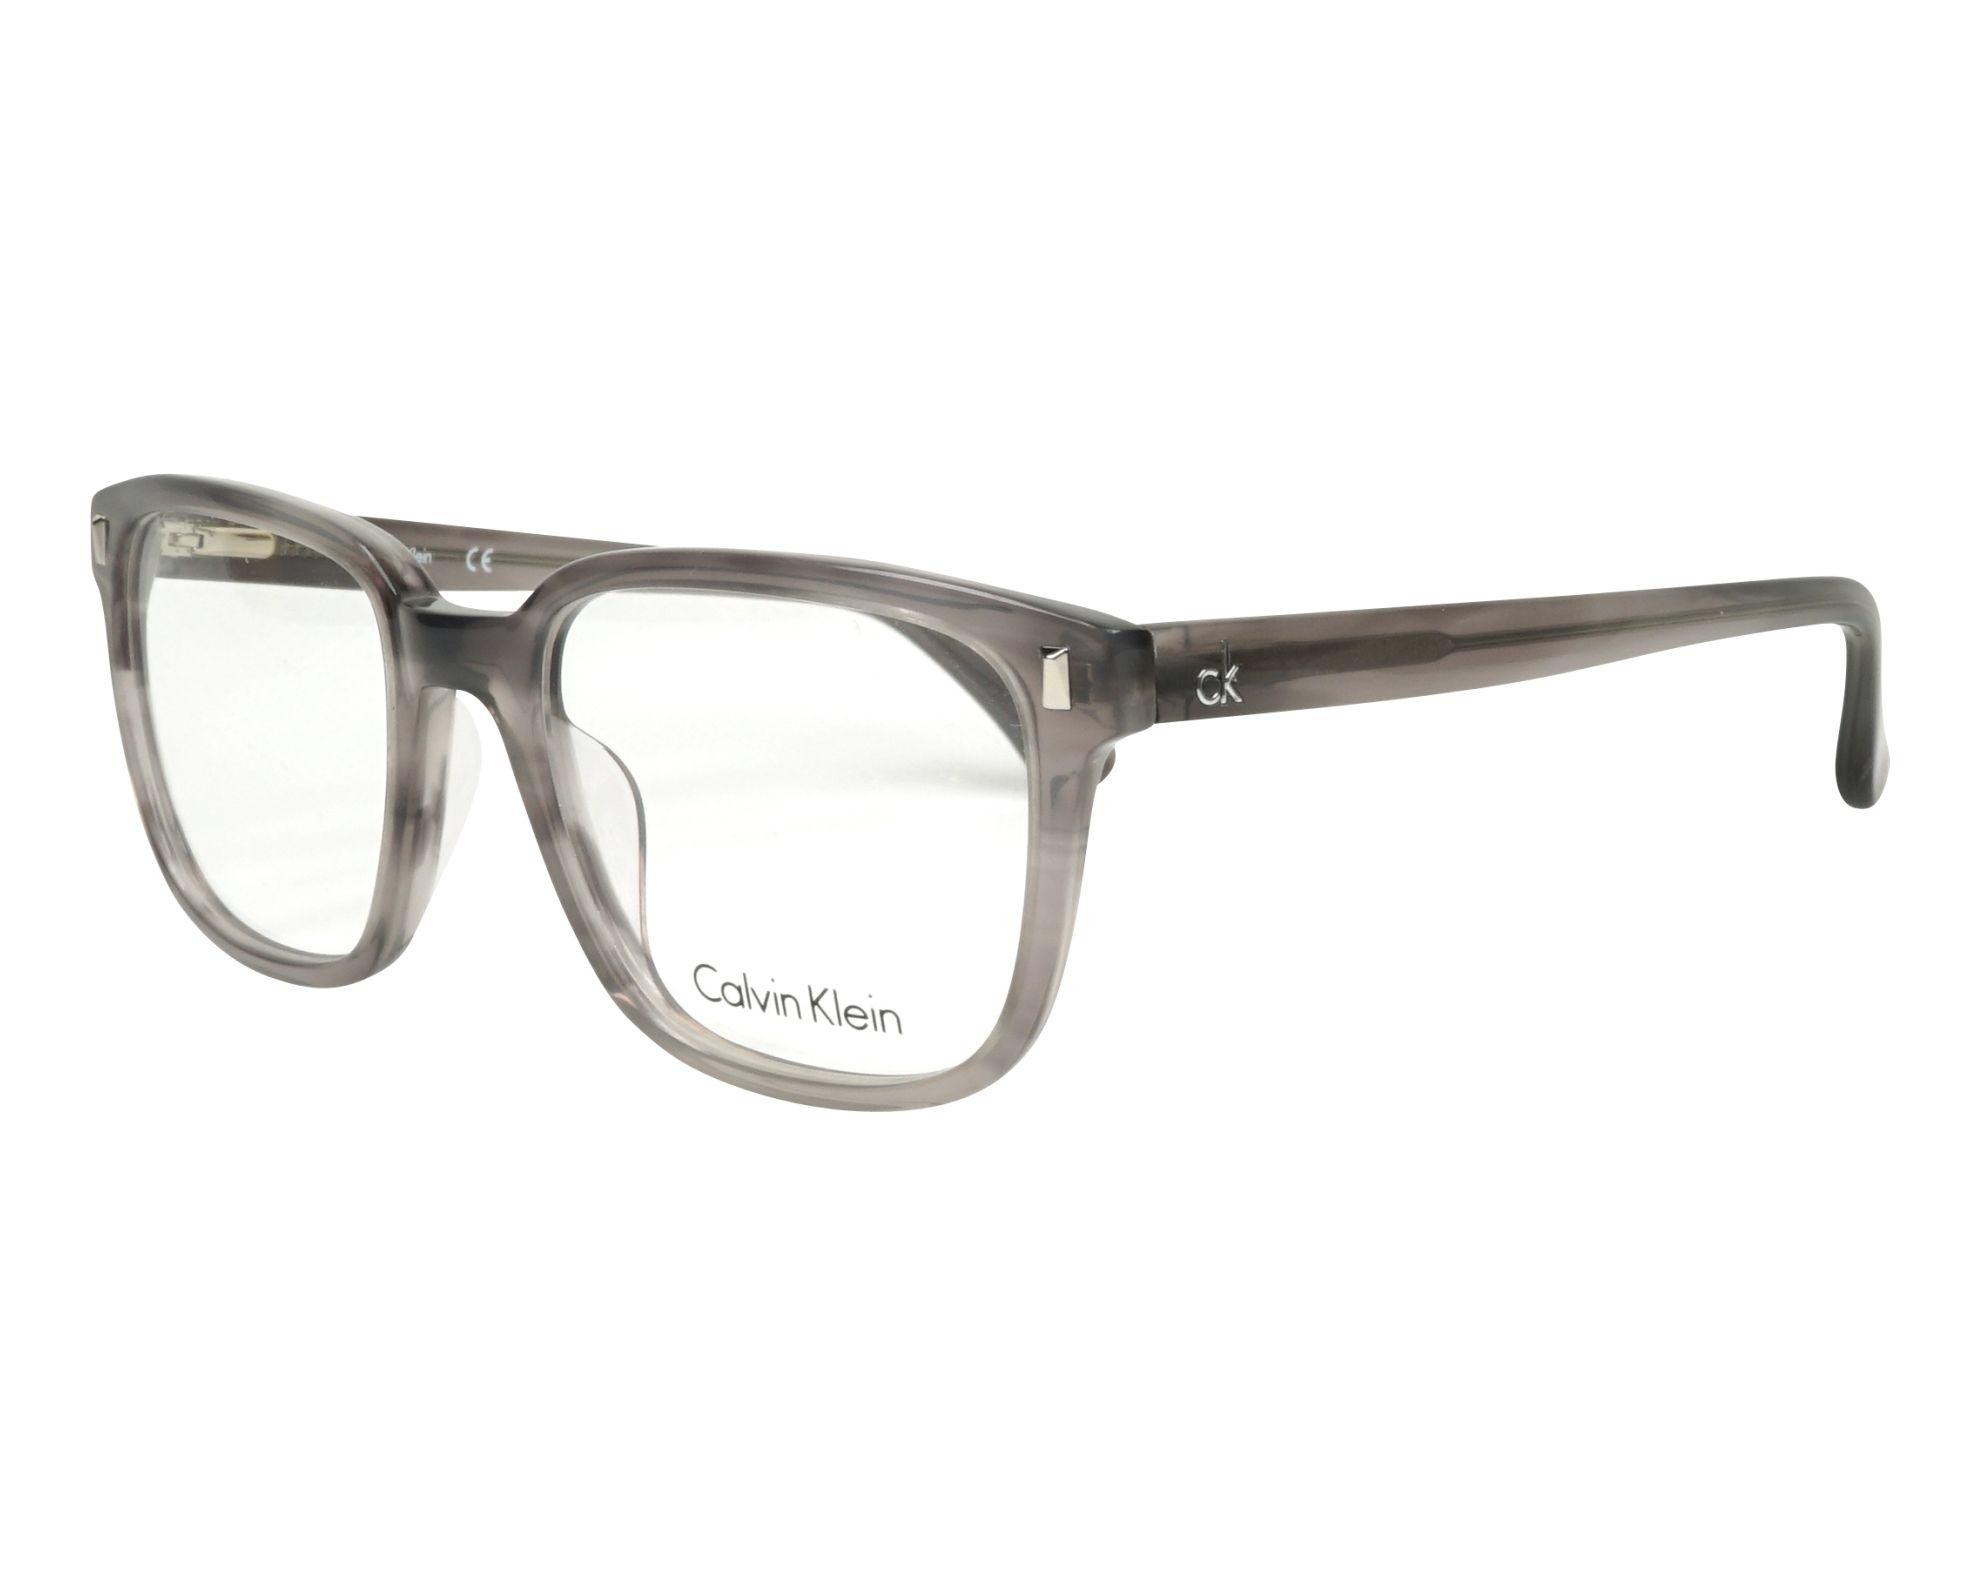 8f08c4e1b3 Gafas Graduadas Calvin Klein CK-5862 275 52-19 Gris Gris vista de perfil